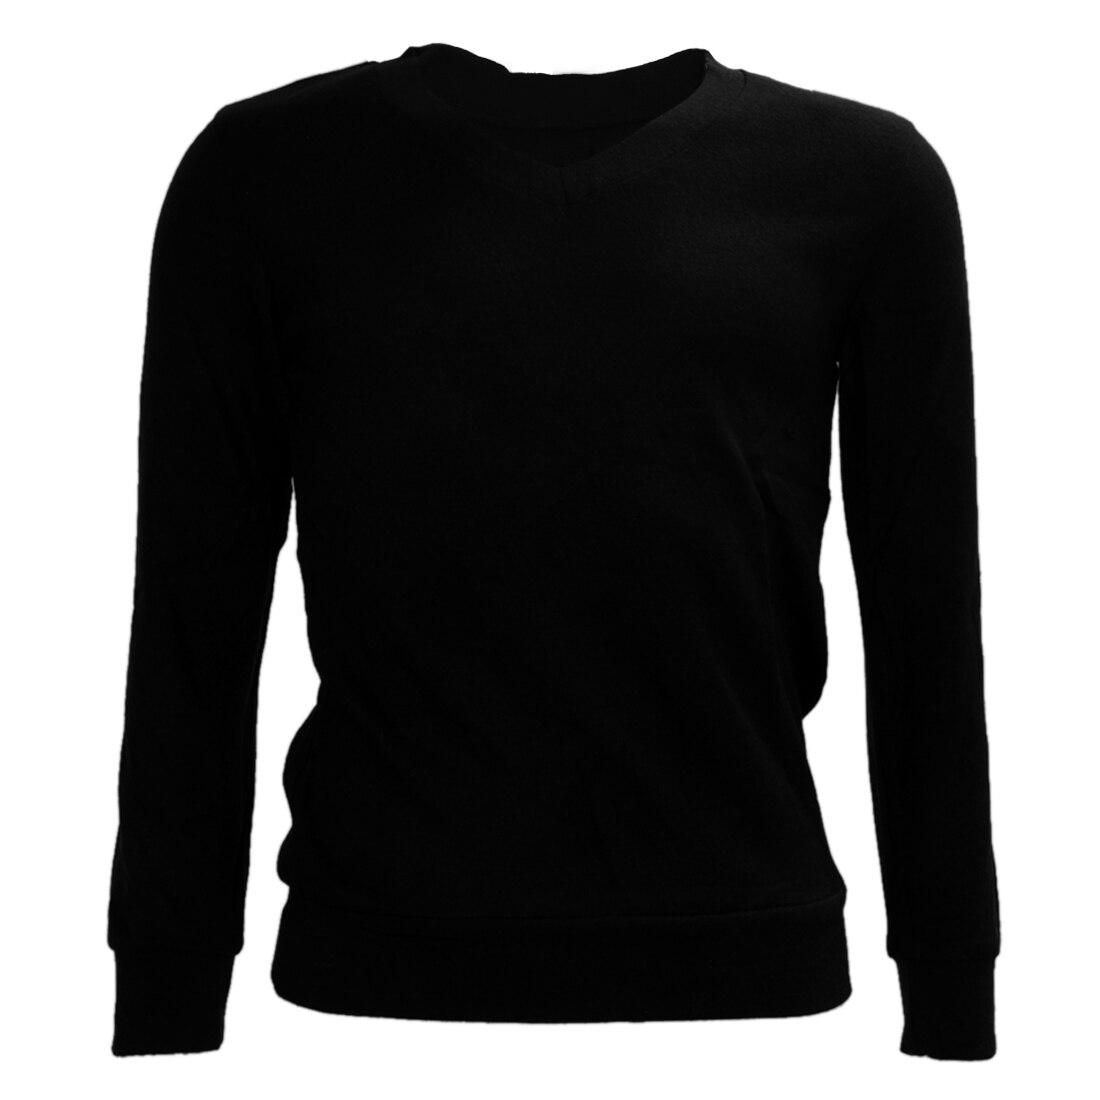 SAF Men V Neck Long sleeved Casual Fall Slim Fit Cashmere Sweater 3 COLORS